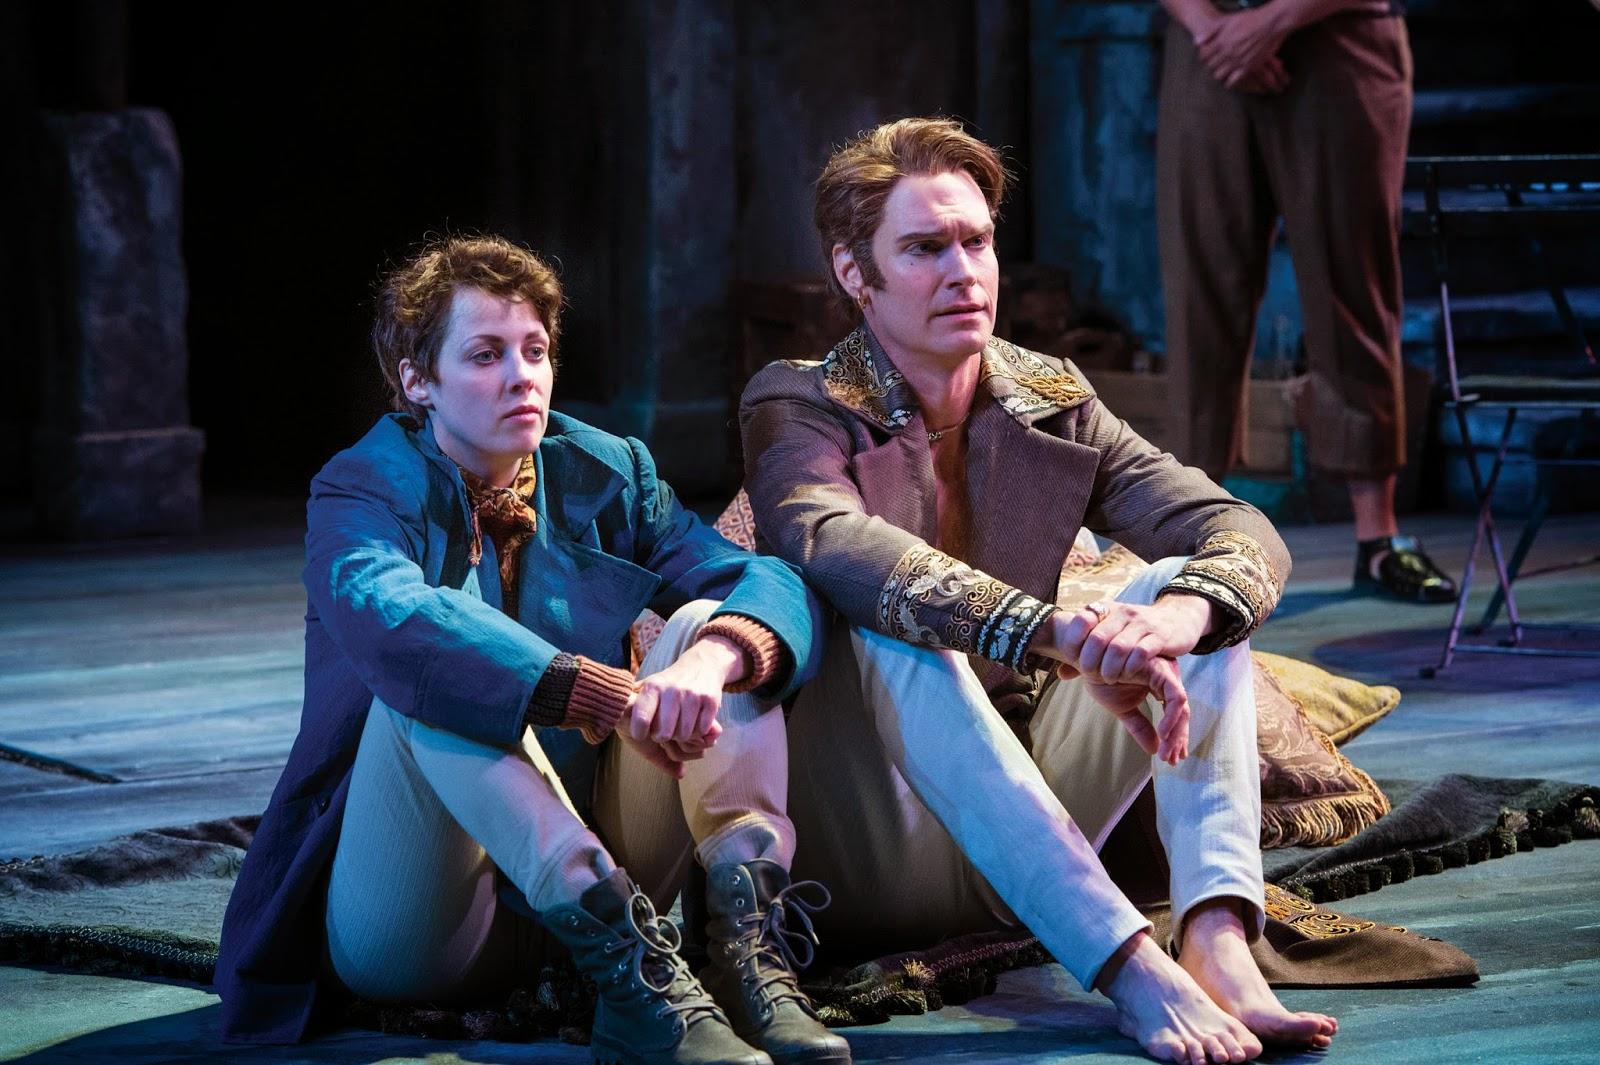 Neil Geisslinger and Grant Goodman in Twelfth Night